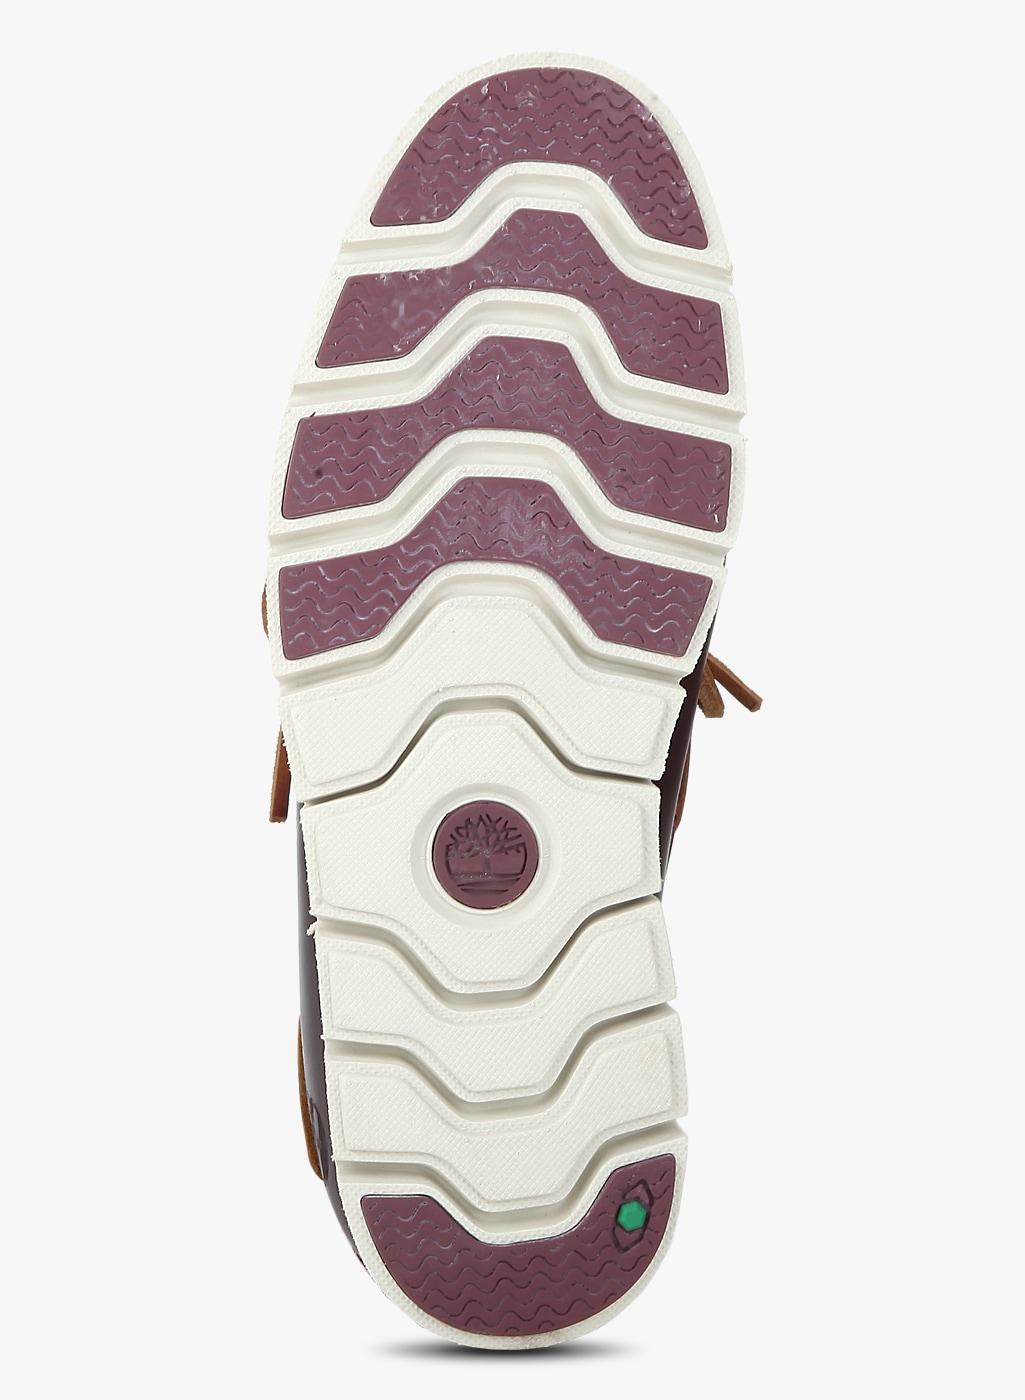 b082b0b8dc2b6 Men Boat Shoes Gas Timberland - Buy Men Boat Shoes Gas Timberland online in  India - Jabong